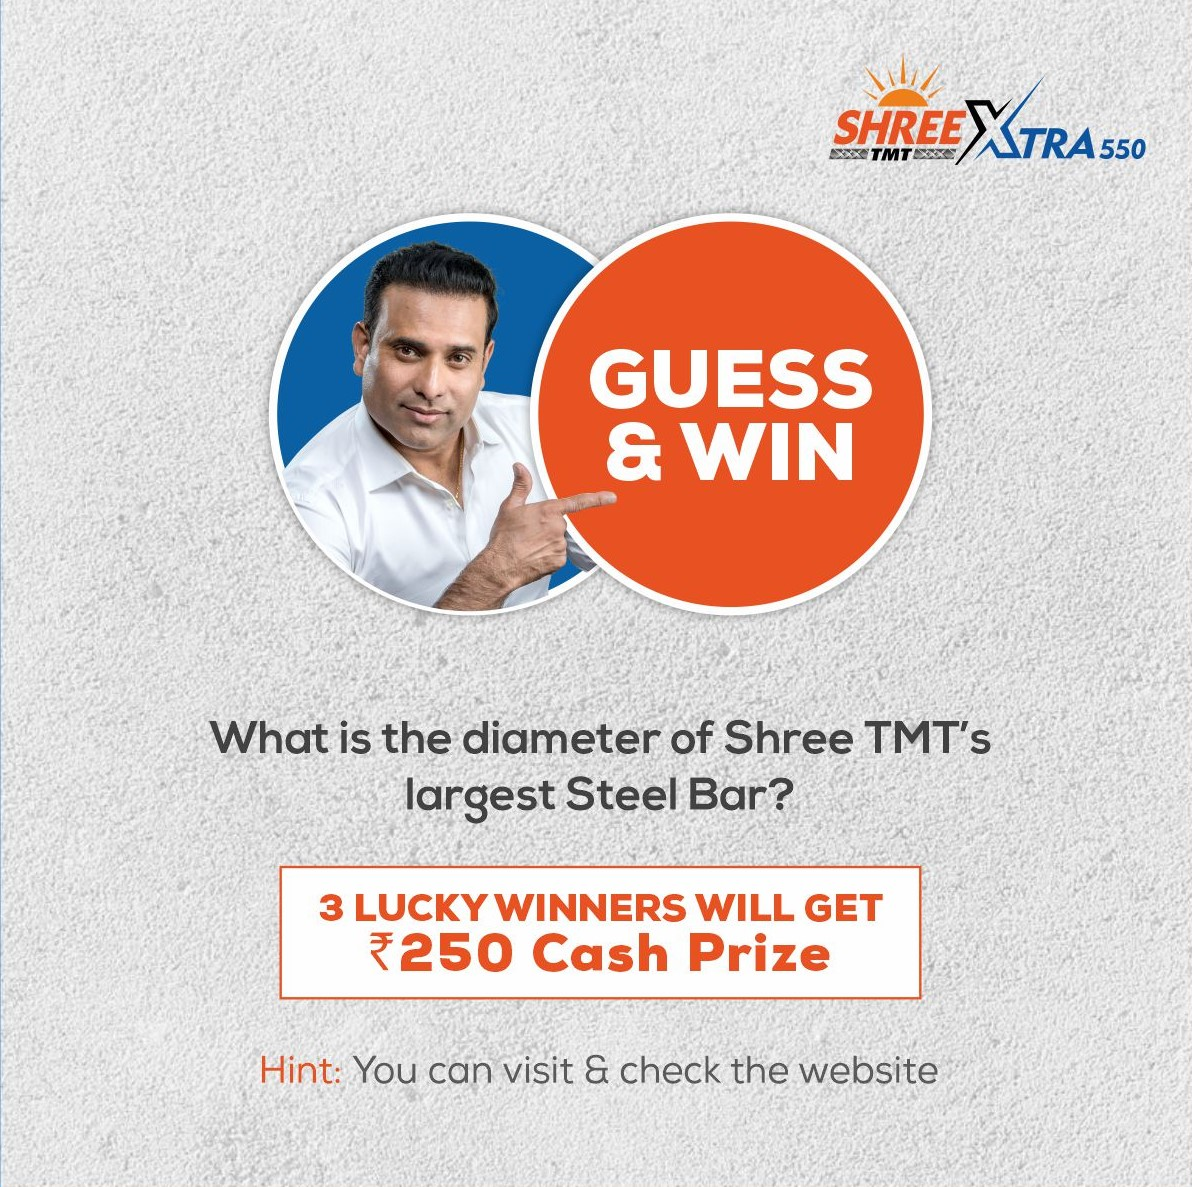 @shreetmtpremium 36 mm   https://t.co/RXYB1Ouedn,   #contest #cashprize #steel #tmt #tmtbars #shreetmtsteel #hyderabd #tmtsteel #india https://t.co/NgGGQJWelv